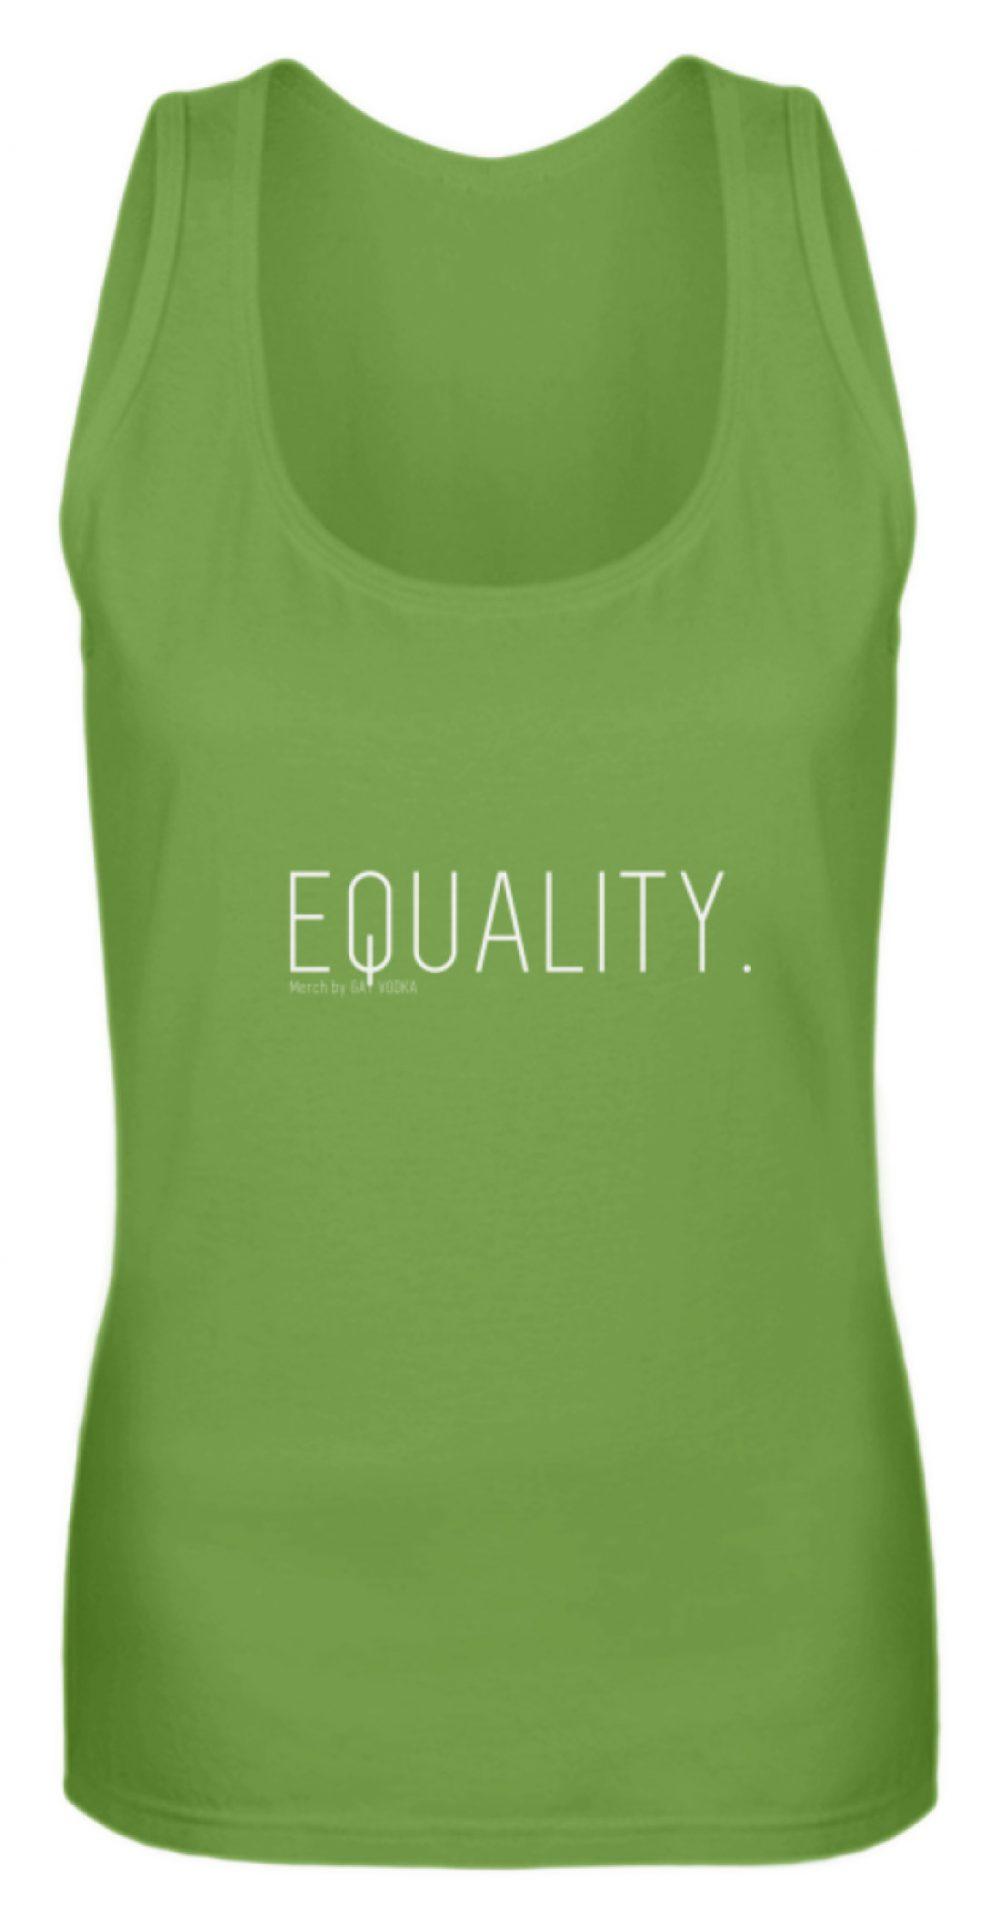 EQUALITY. - Frauen Tanktop-1646